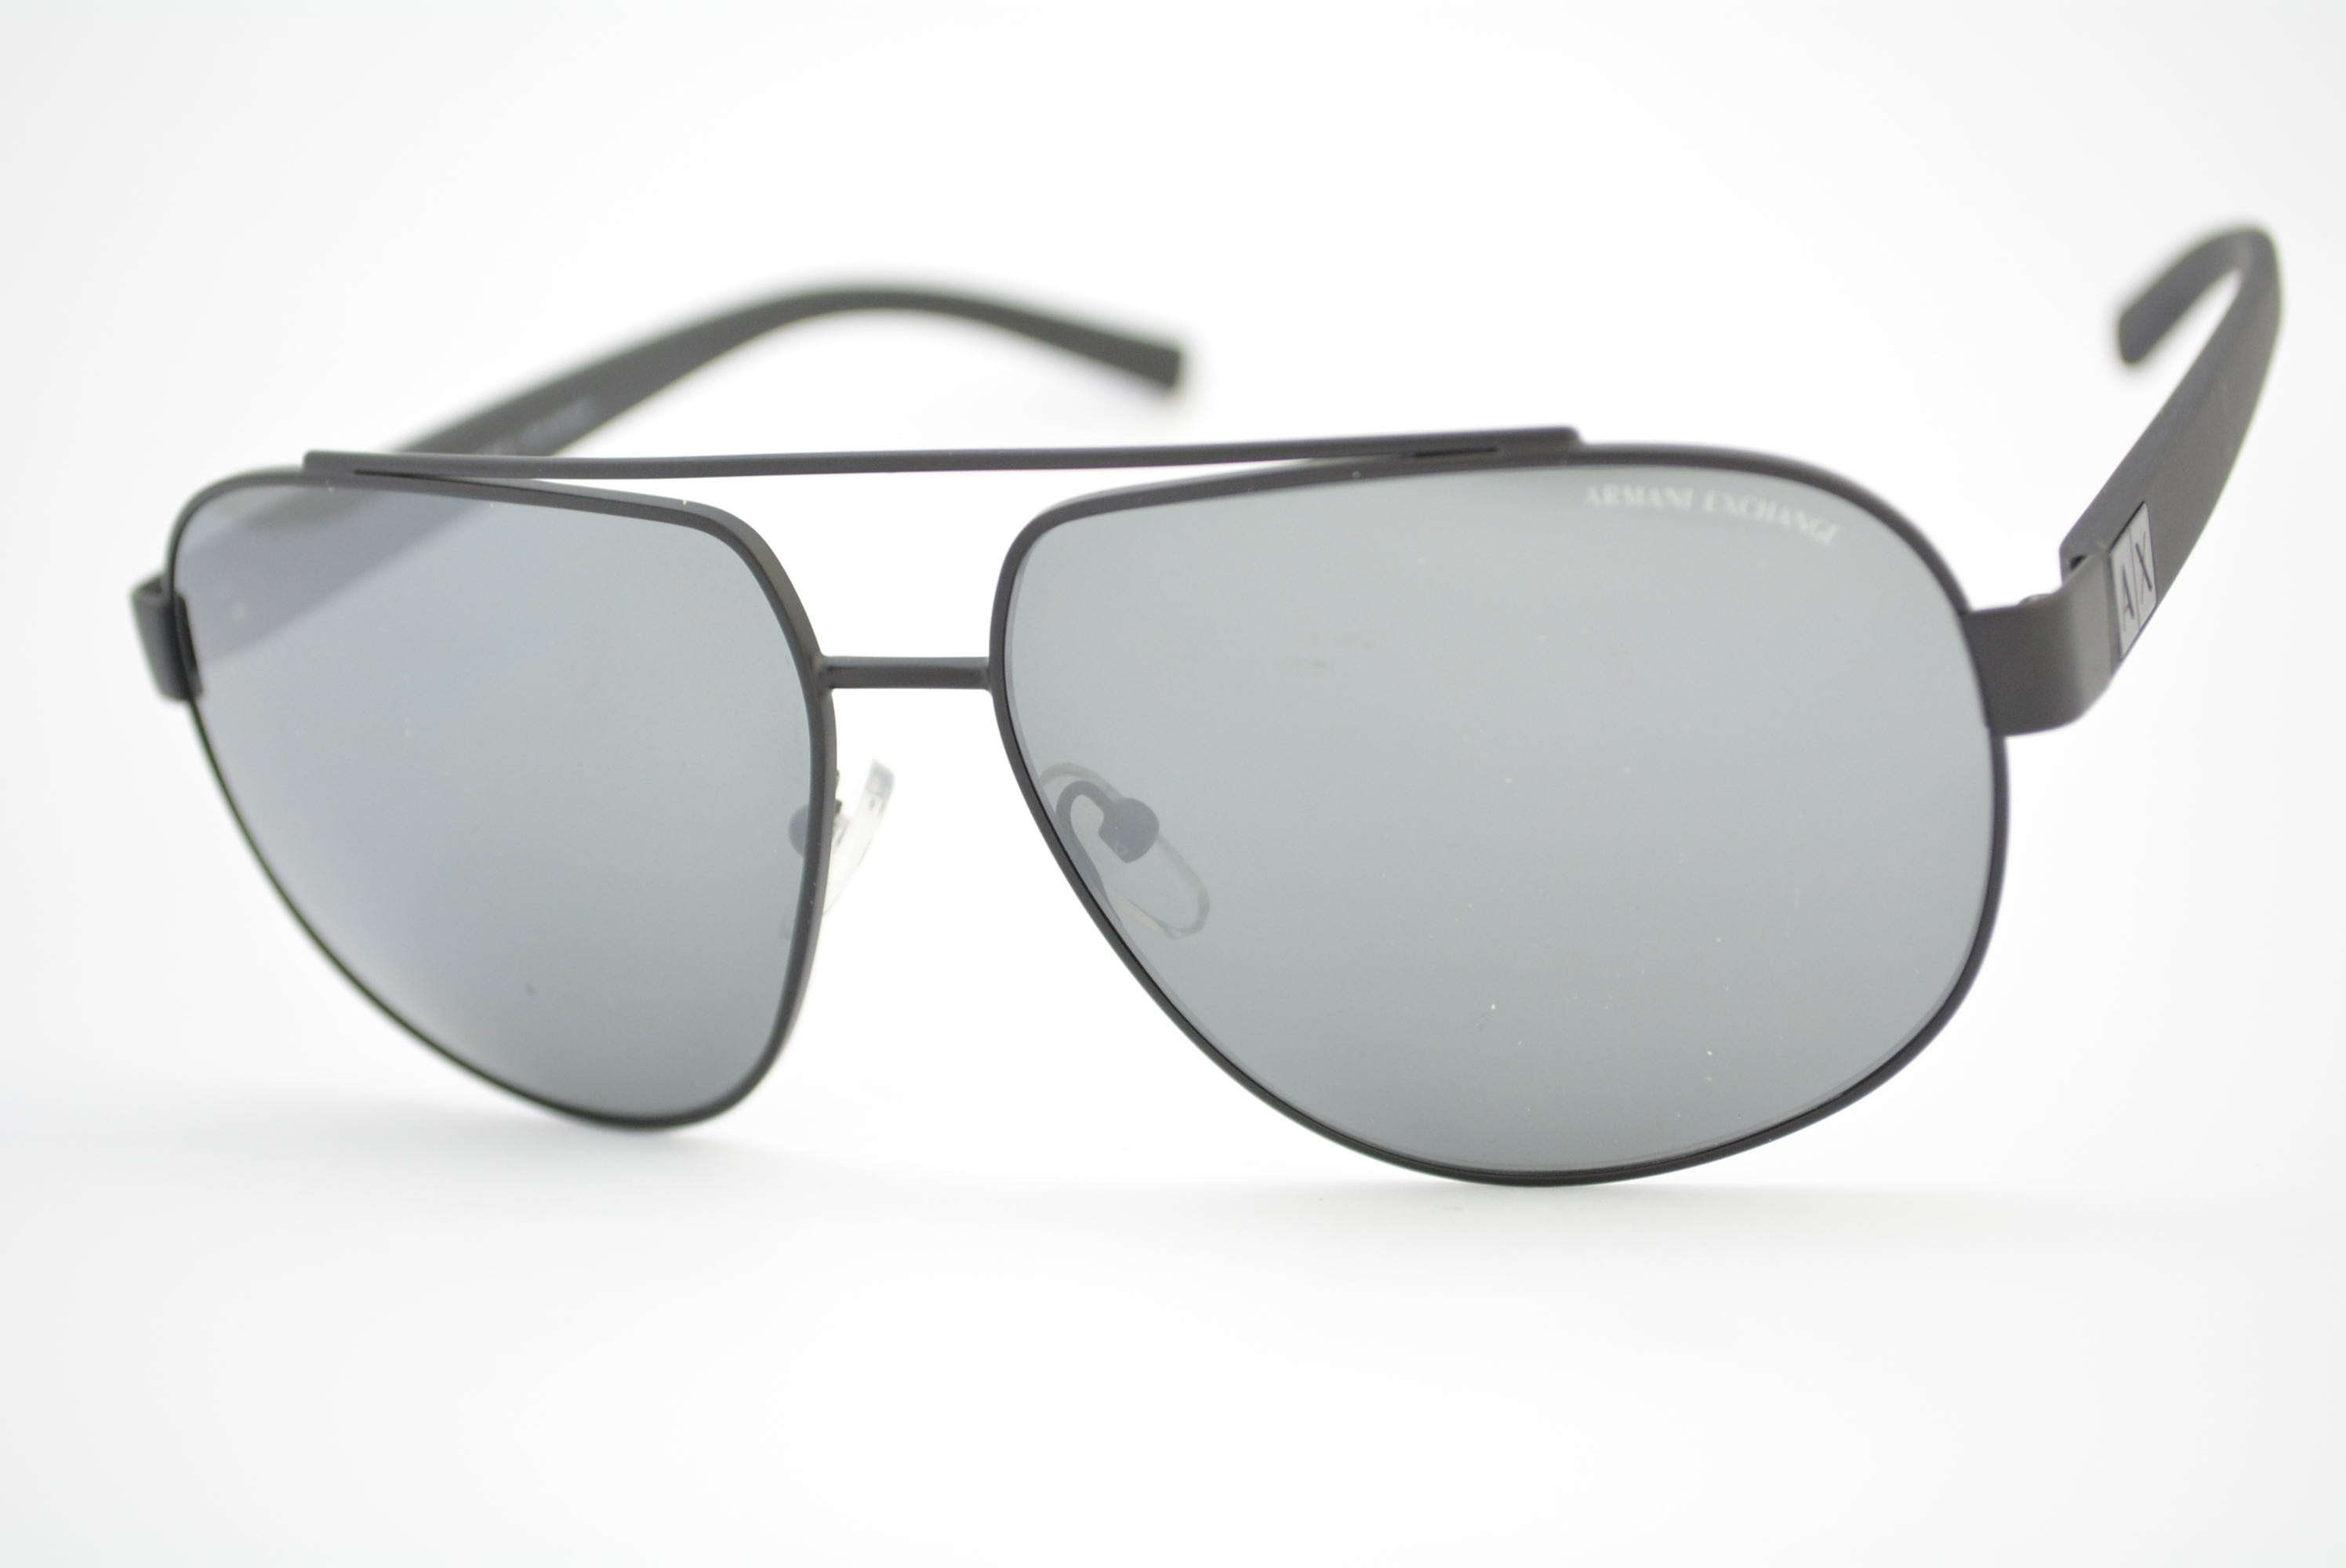 óculos de sol Armani Exchange mod ax2019sl 6063 6g Ótica Cardoso ebcc573e3a